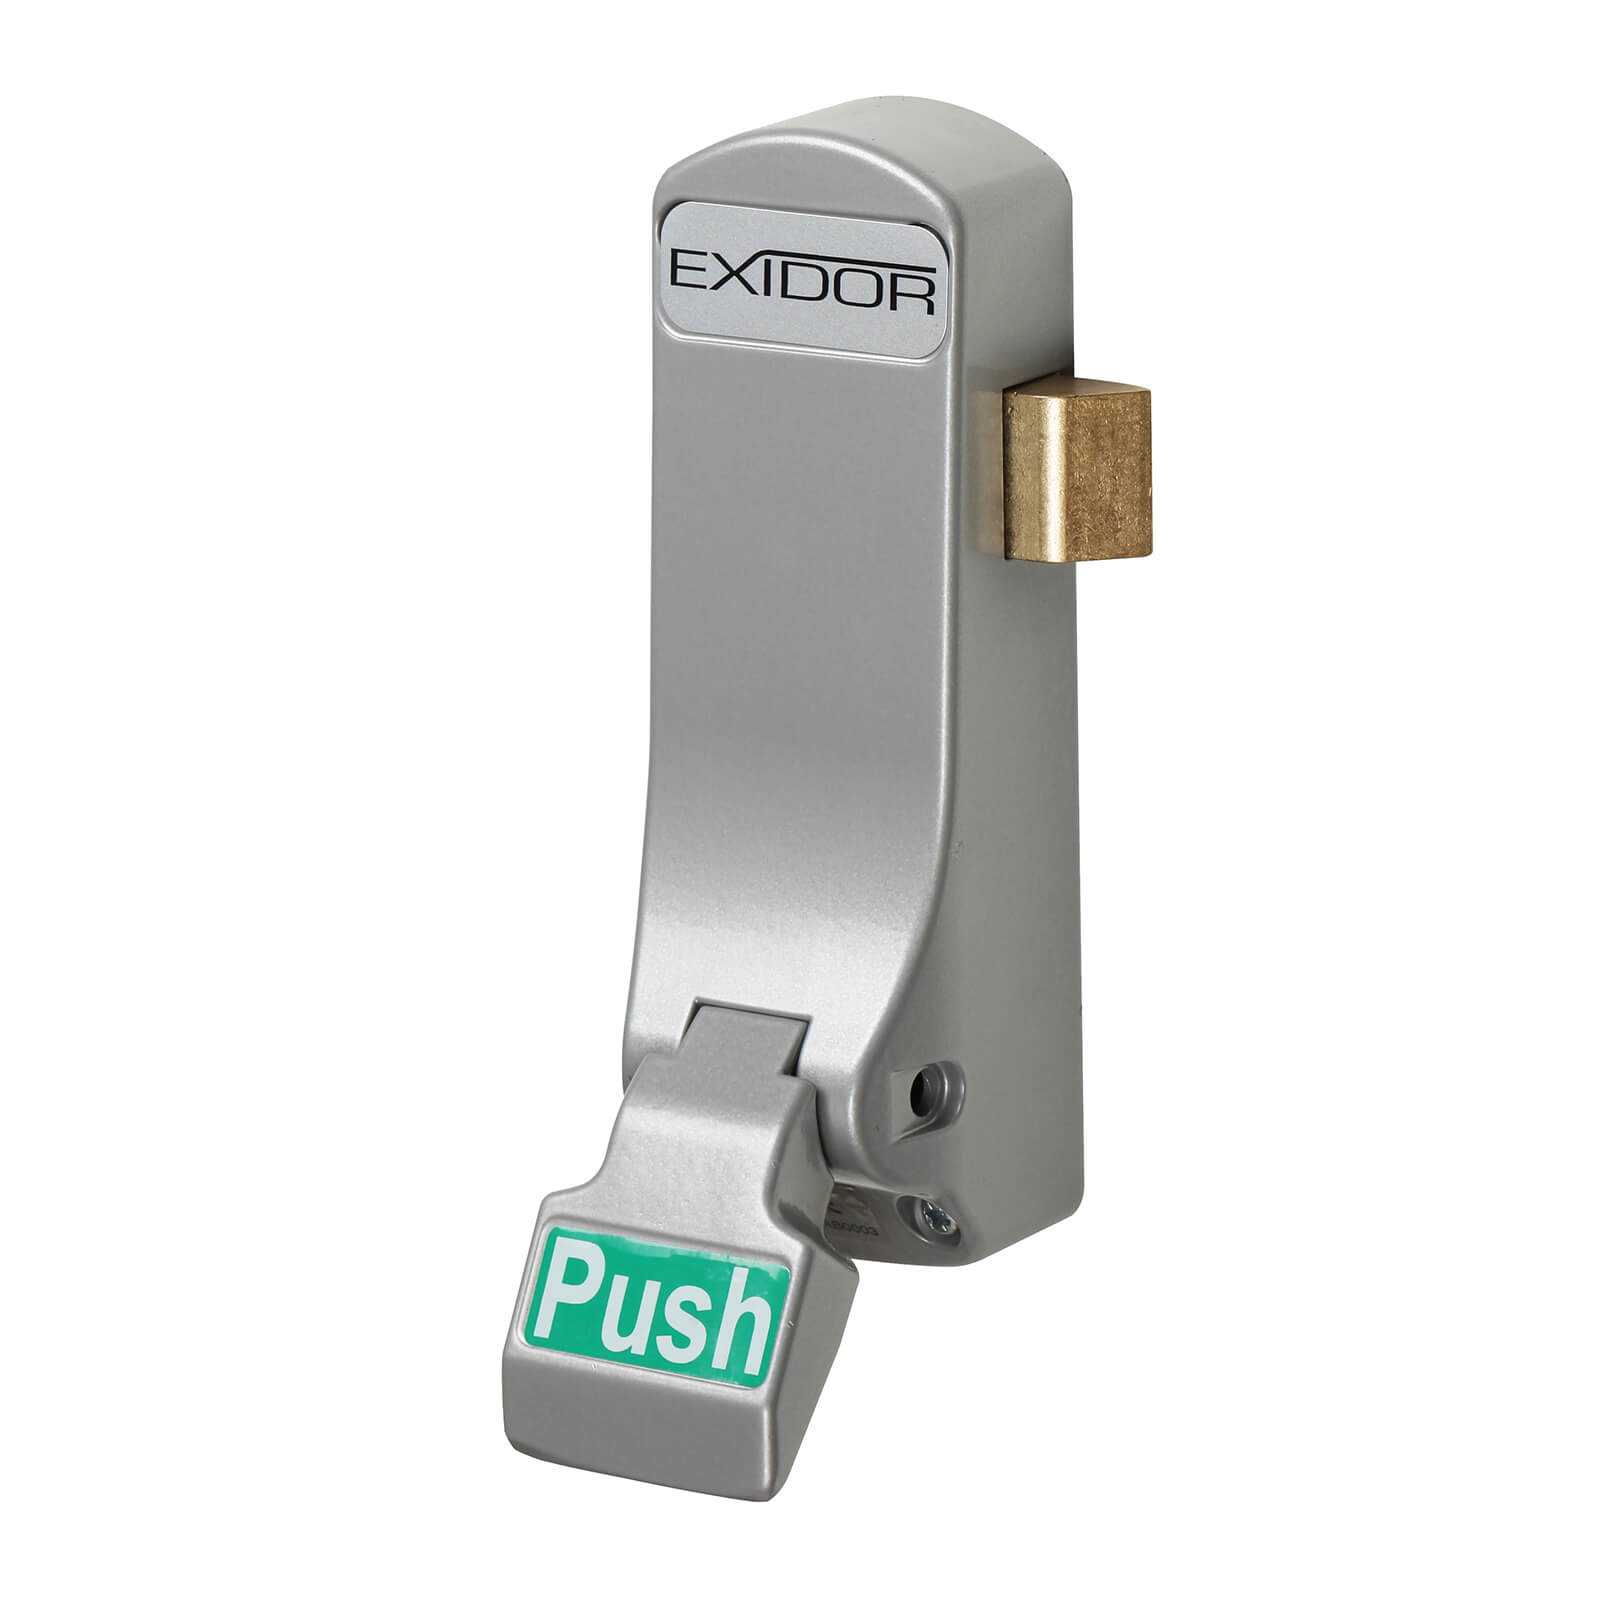 Exidor 297 Push Pad Latham S Steel Security Doors